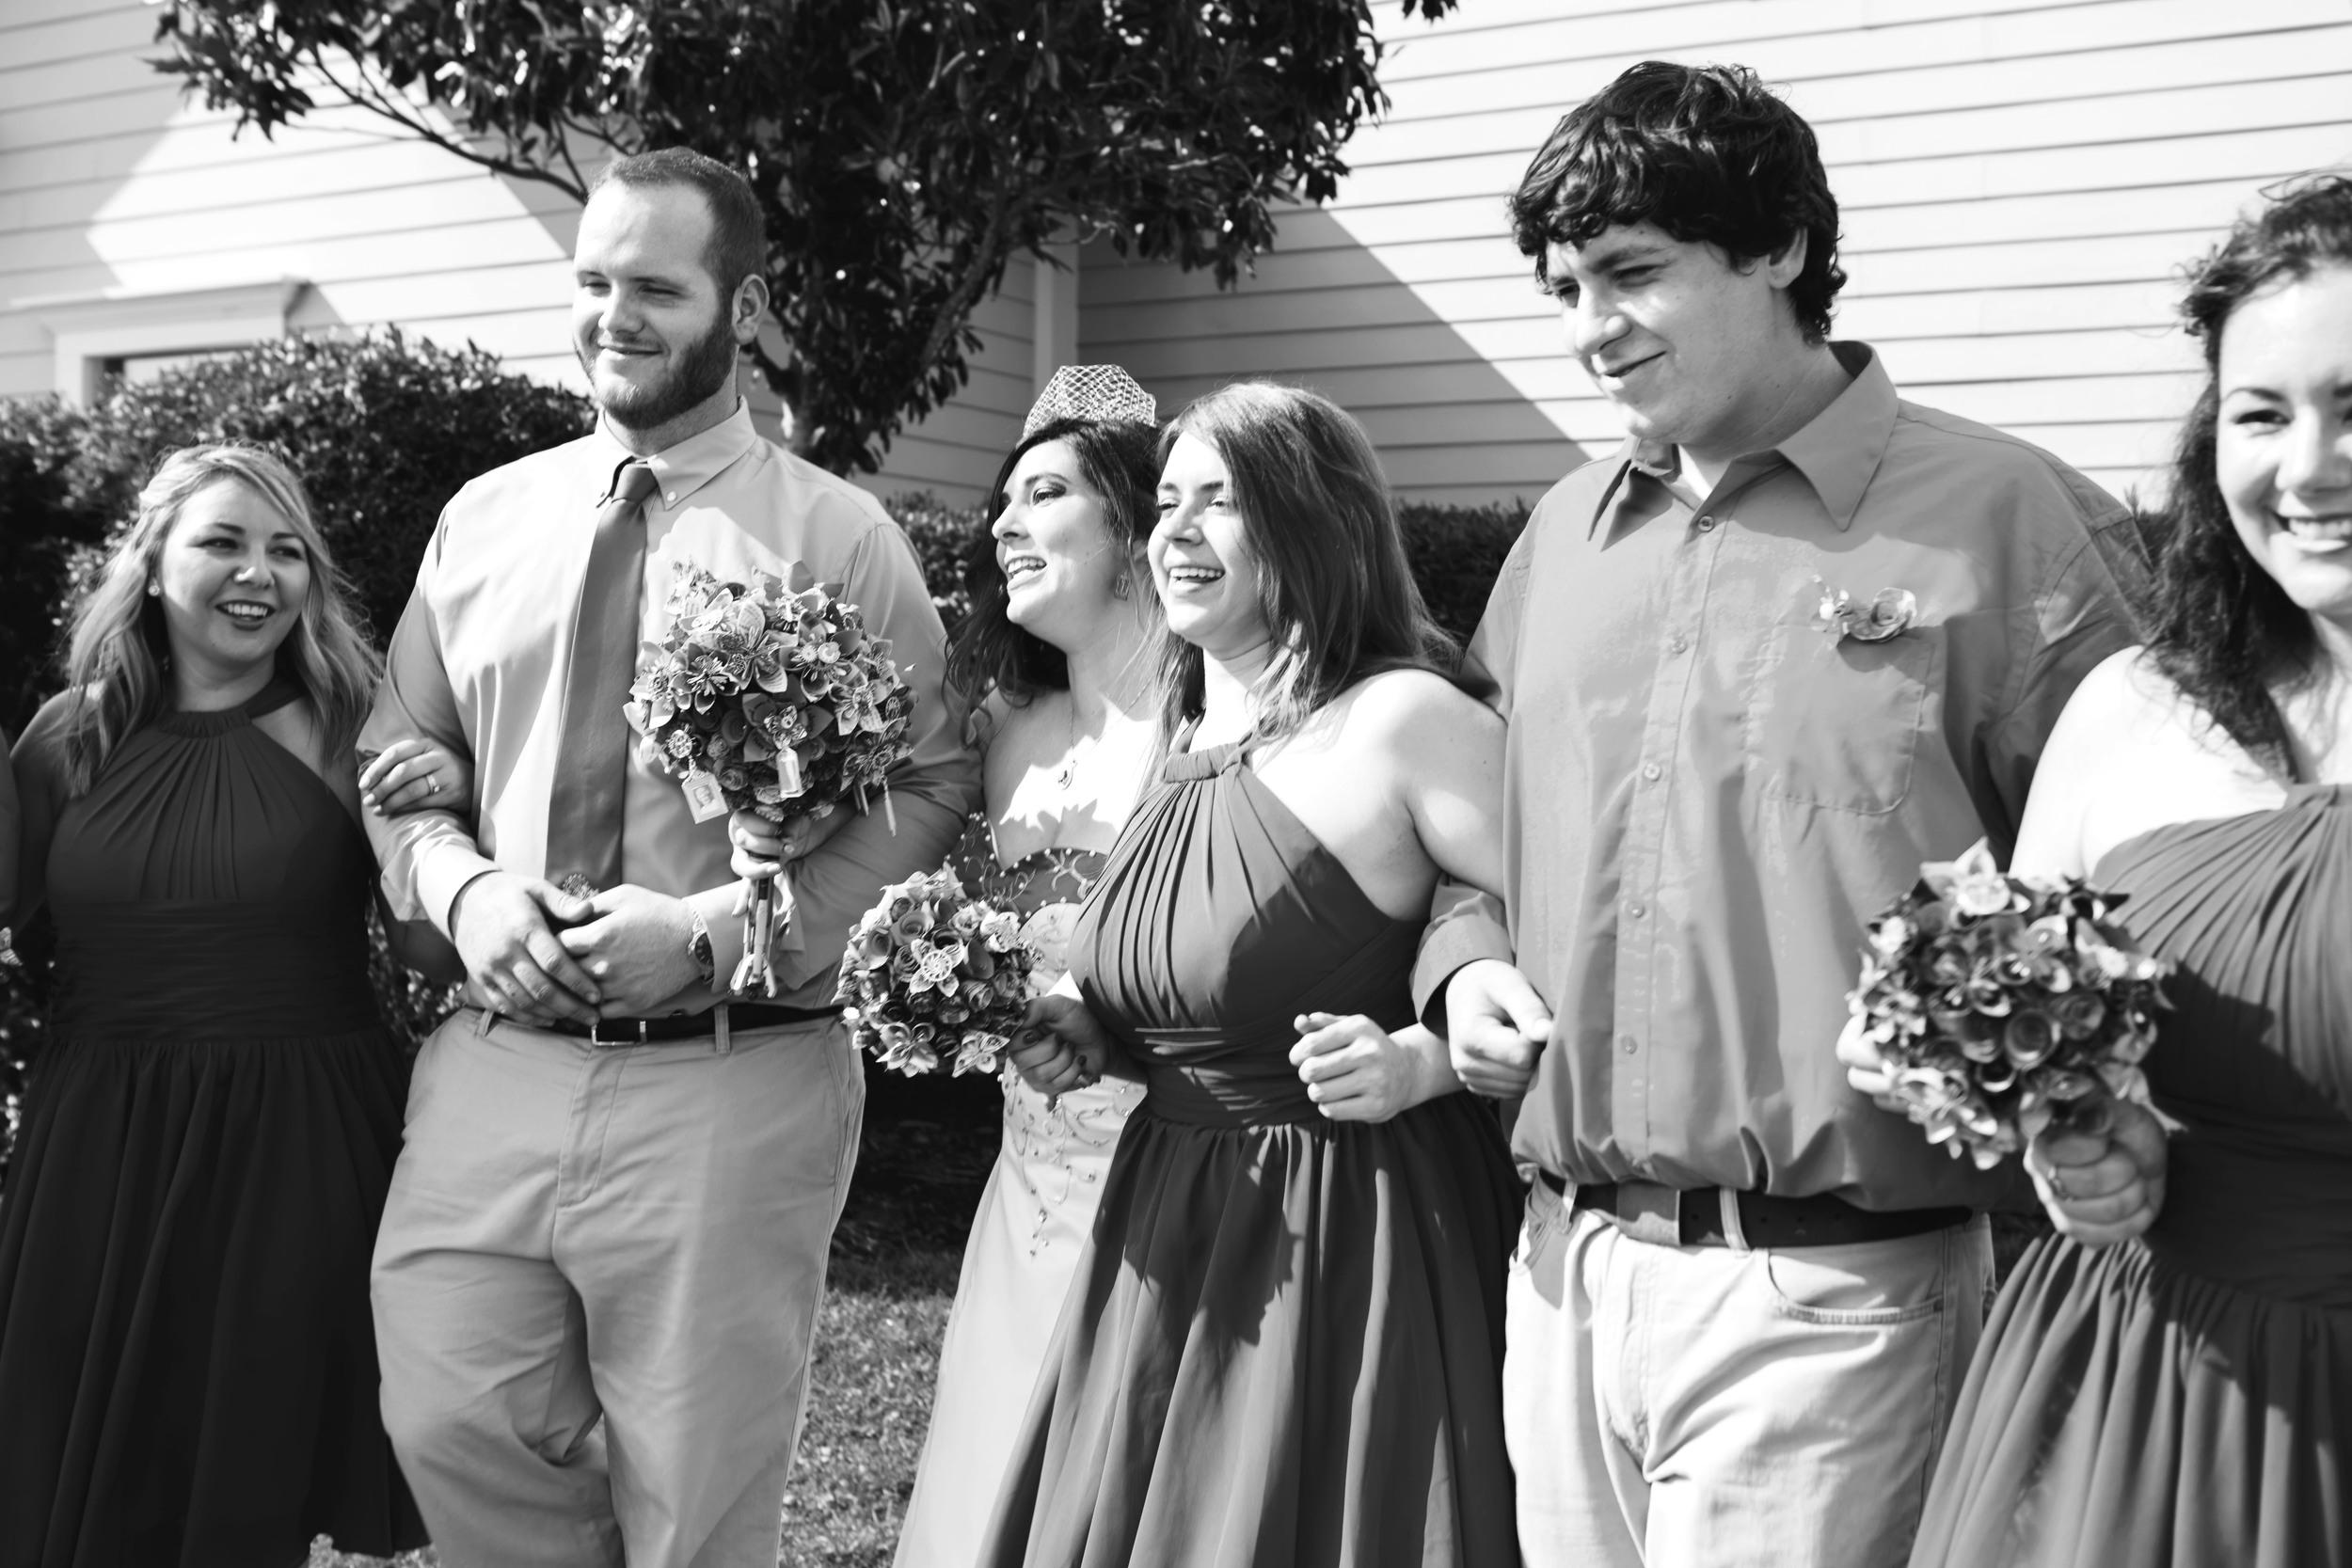 NC_Wedding_Photographer_Tiffany_Abruzzo_Family_Portraits_52.jpg